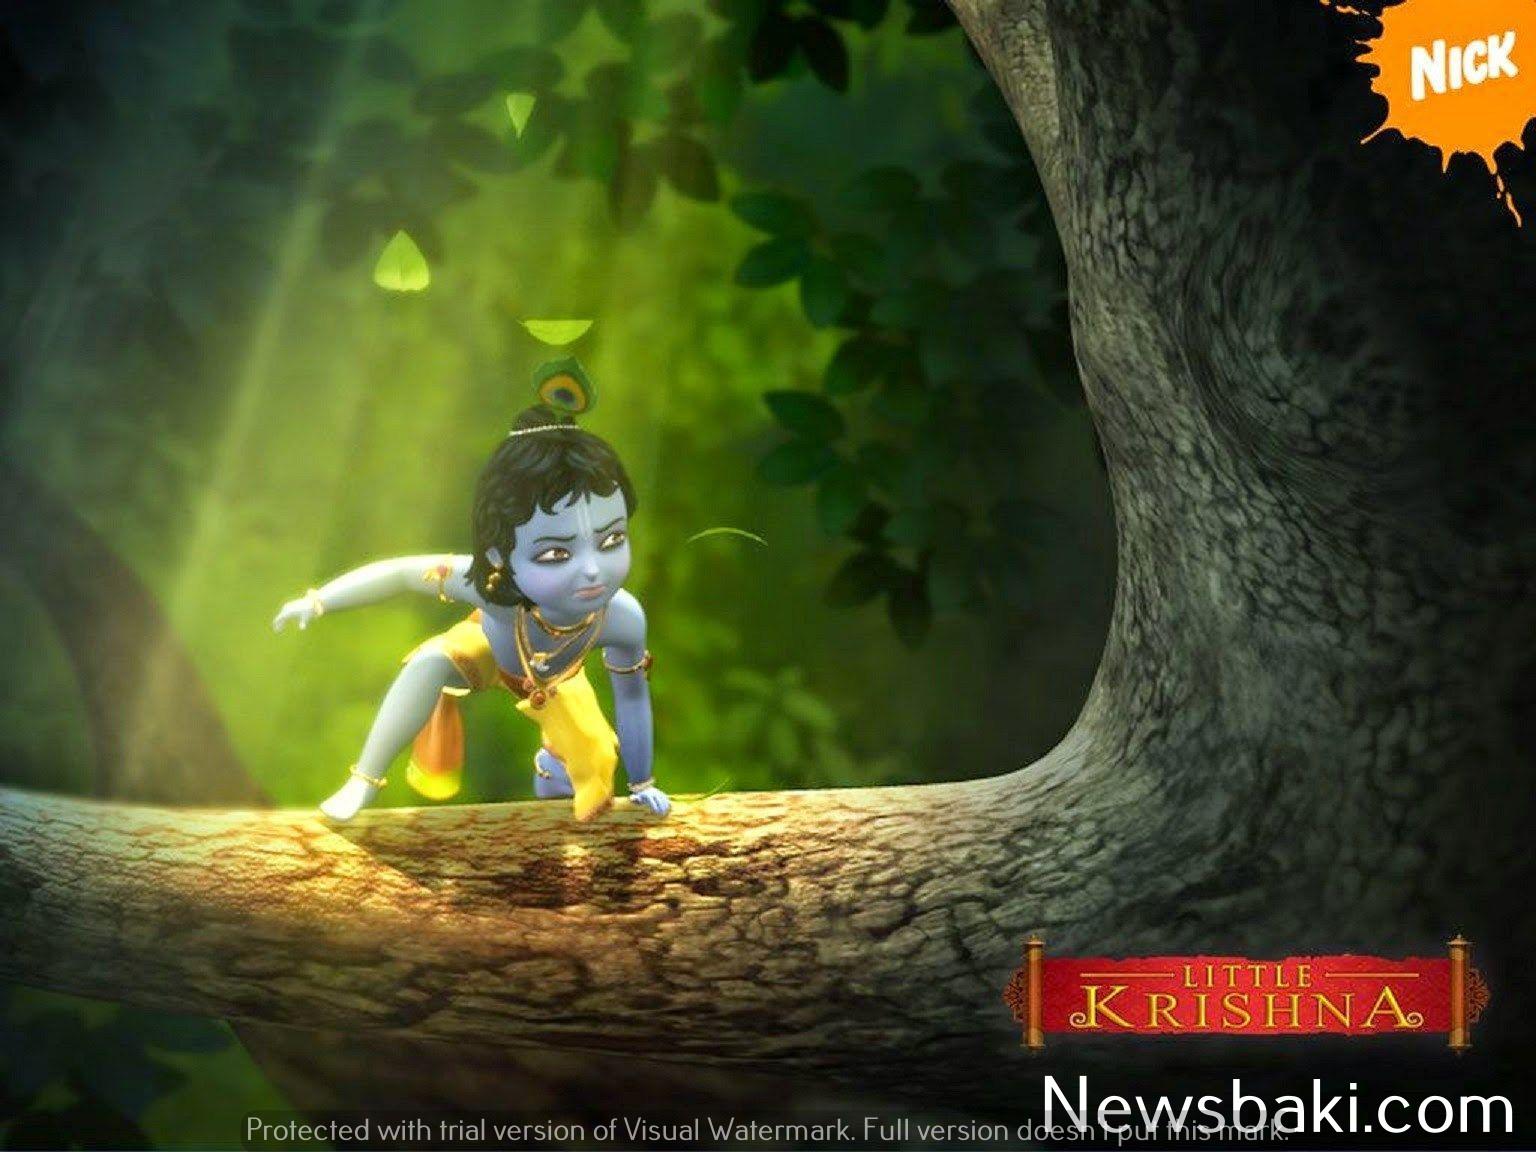 little lord krishna images hd nick 1